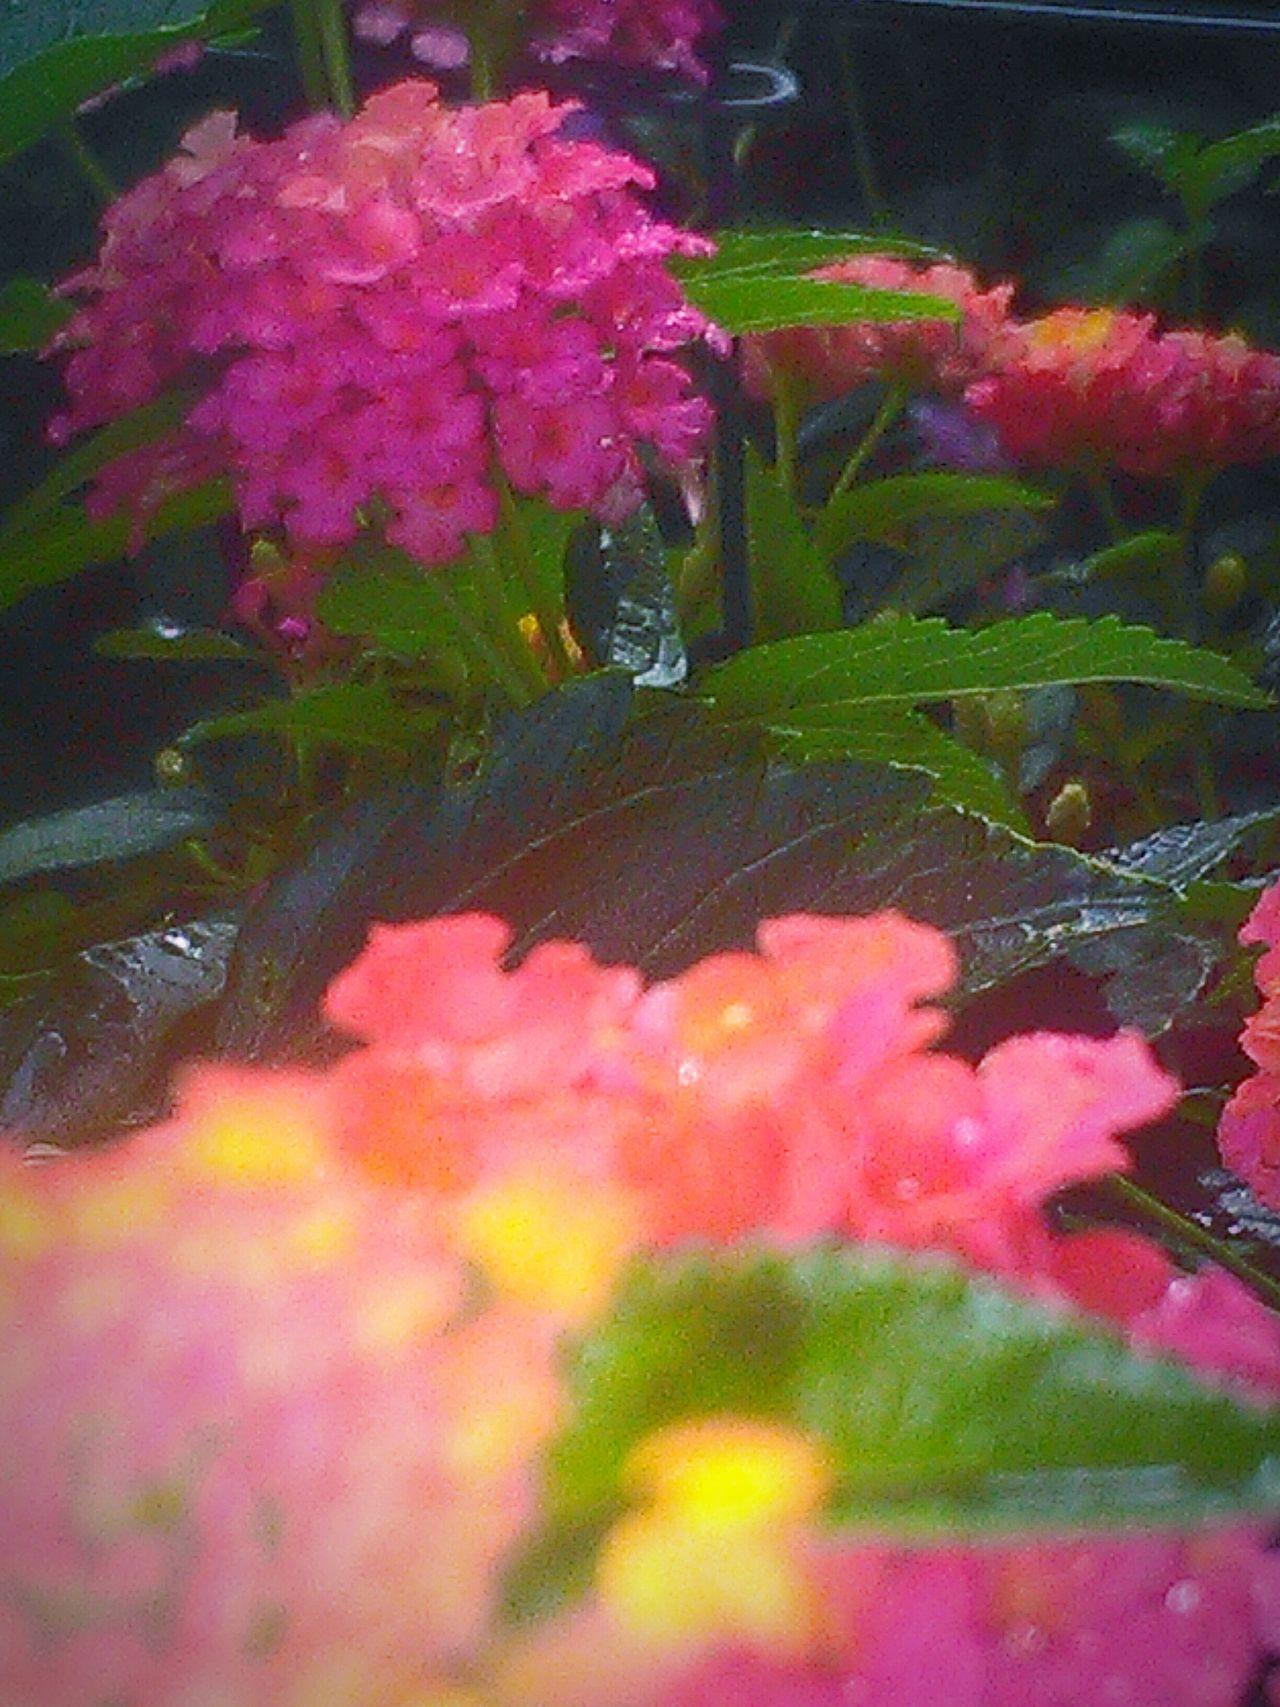 Leaves🌿 Rain Drops On Flowers Rain Drops On Leaves My Photography Flowers,Plants & Garden Rain Drops On Petals Rainy Days☔ Flower Porn Depth Of Field